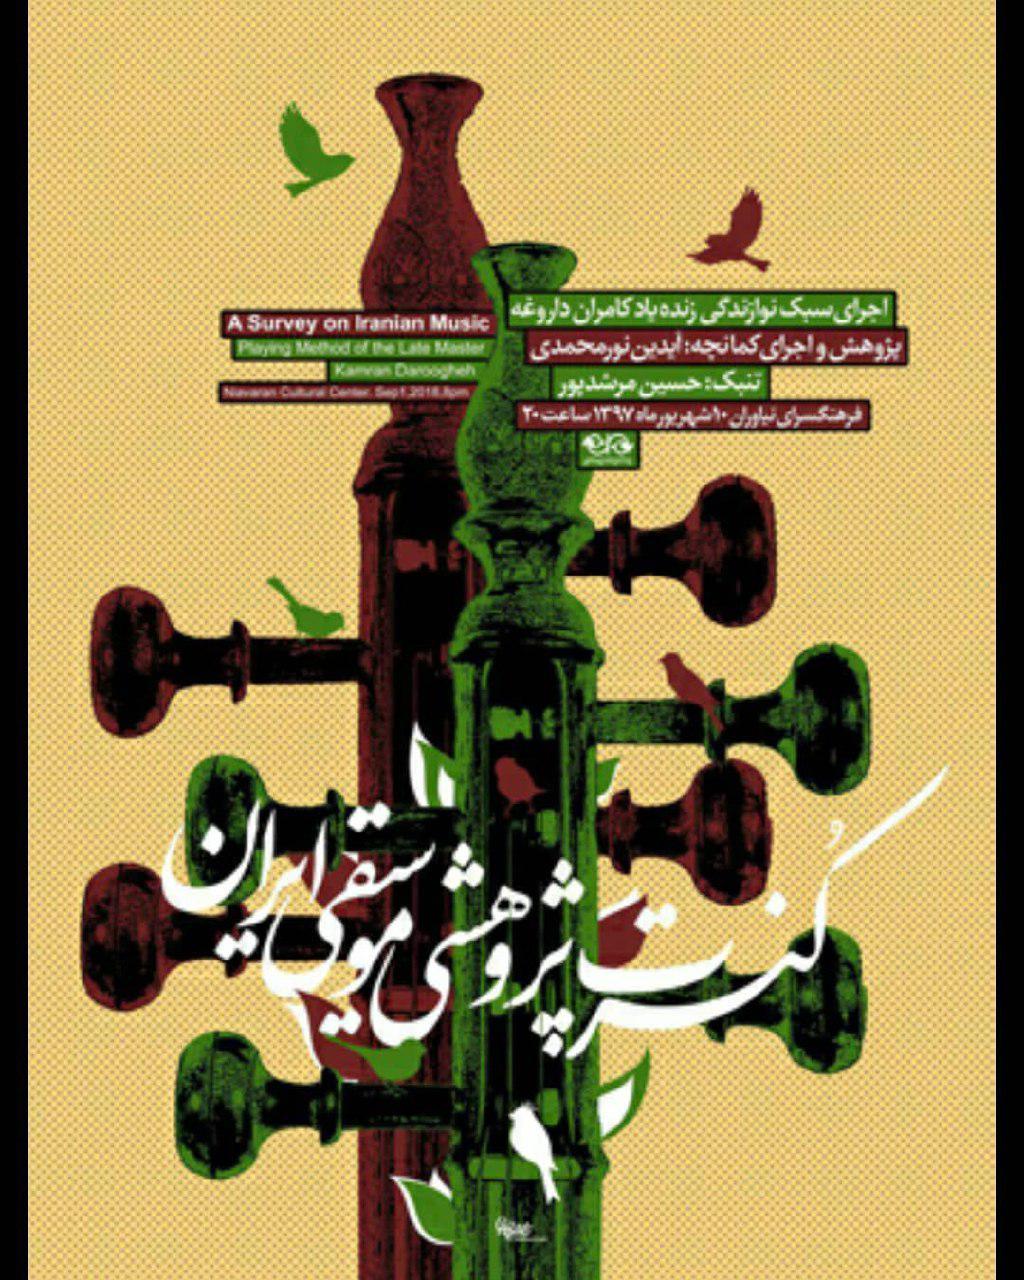 کنسرت پژوهشی موسیقی ایران